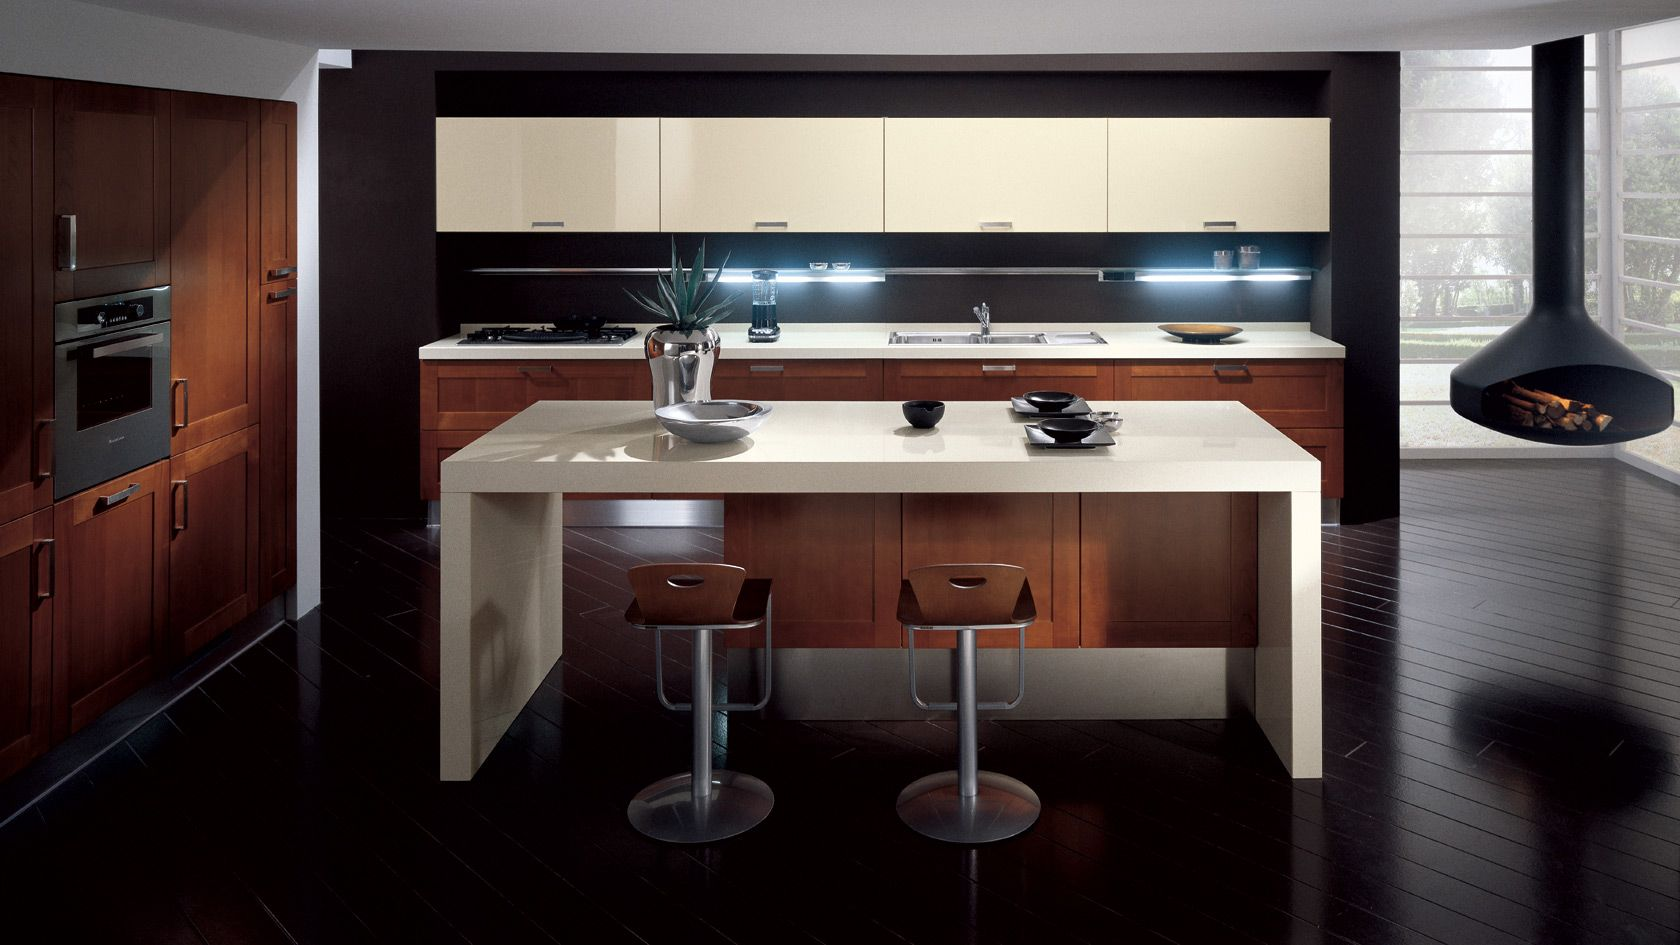 Cucina carol scavolini kitchens pinterest kitchens and interiors